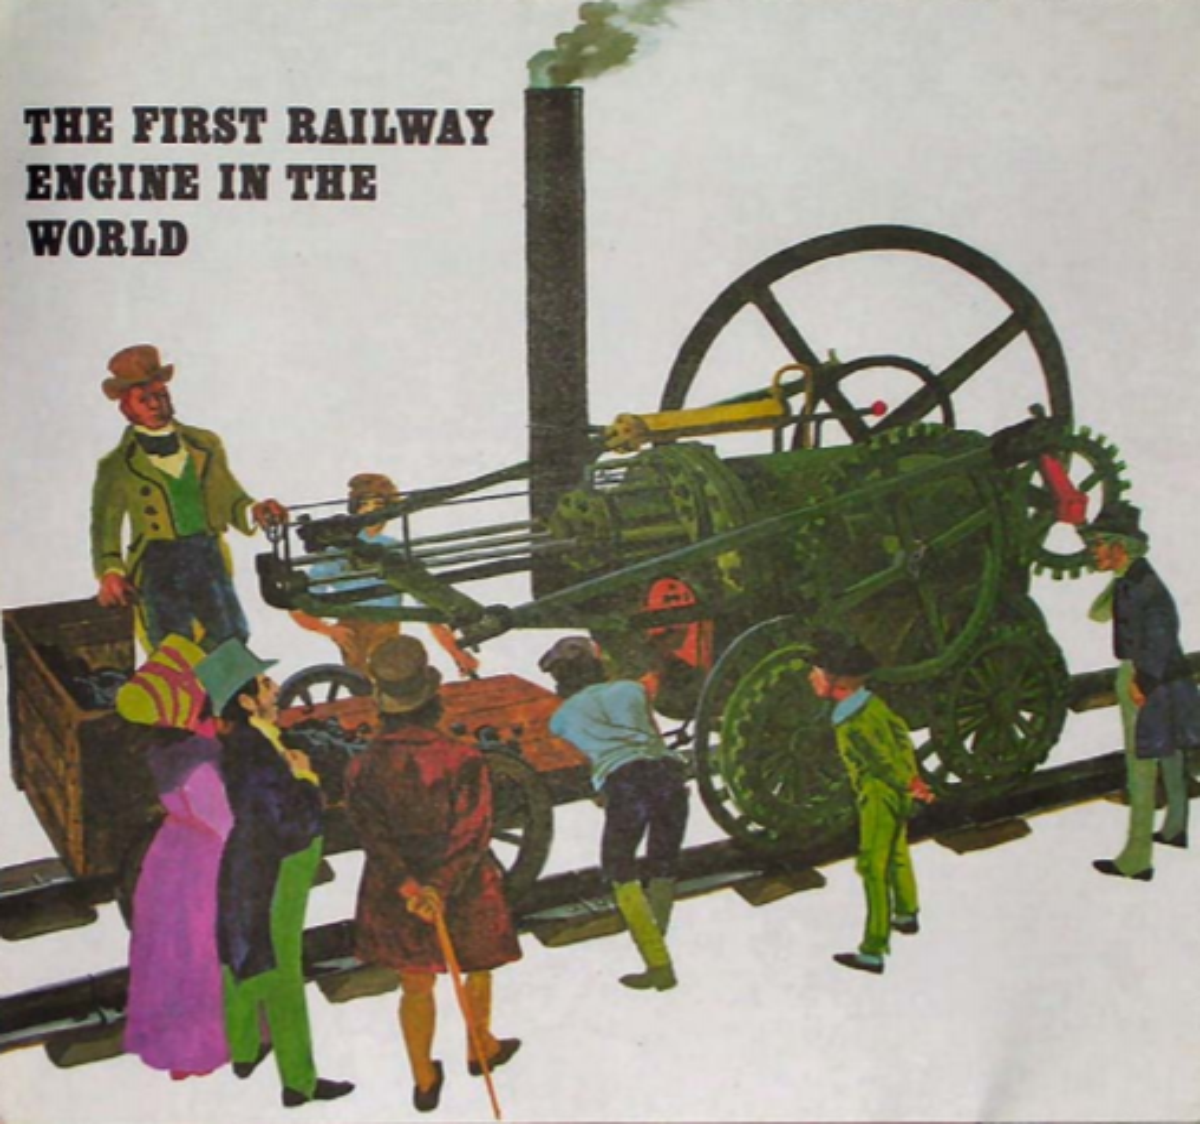 The Coalbrookdale Locomotive